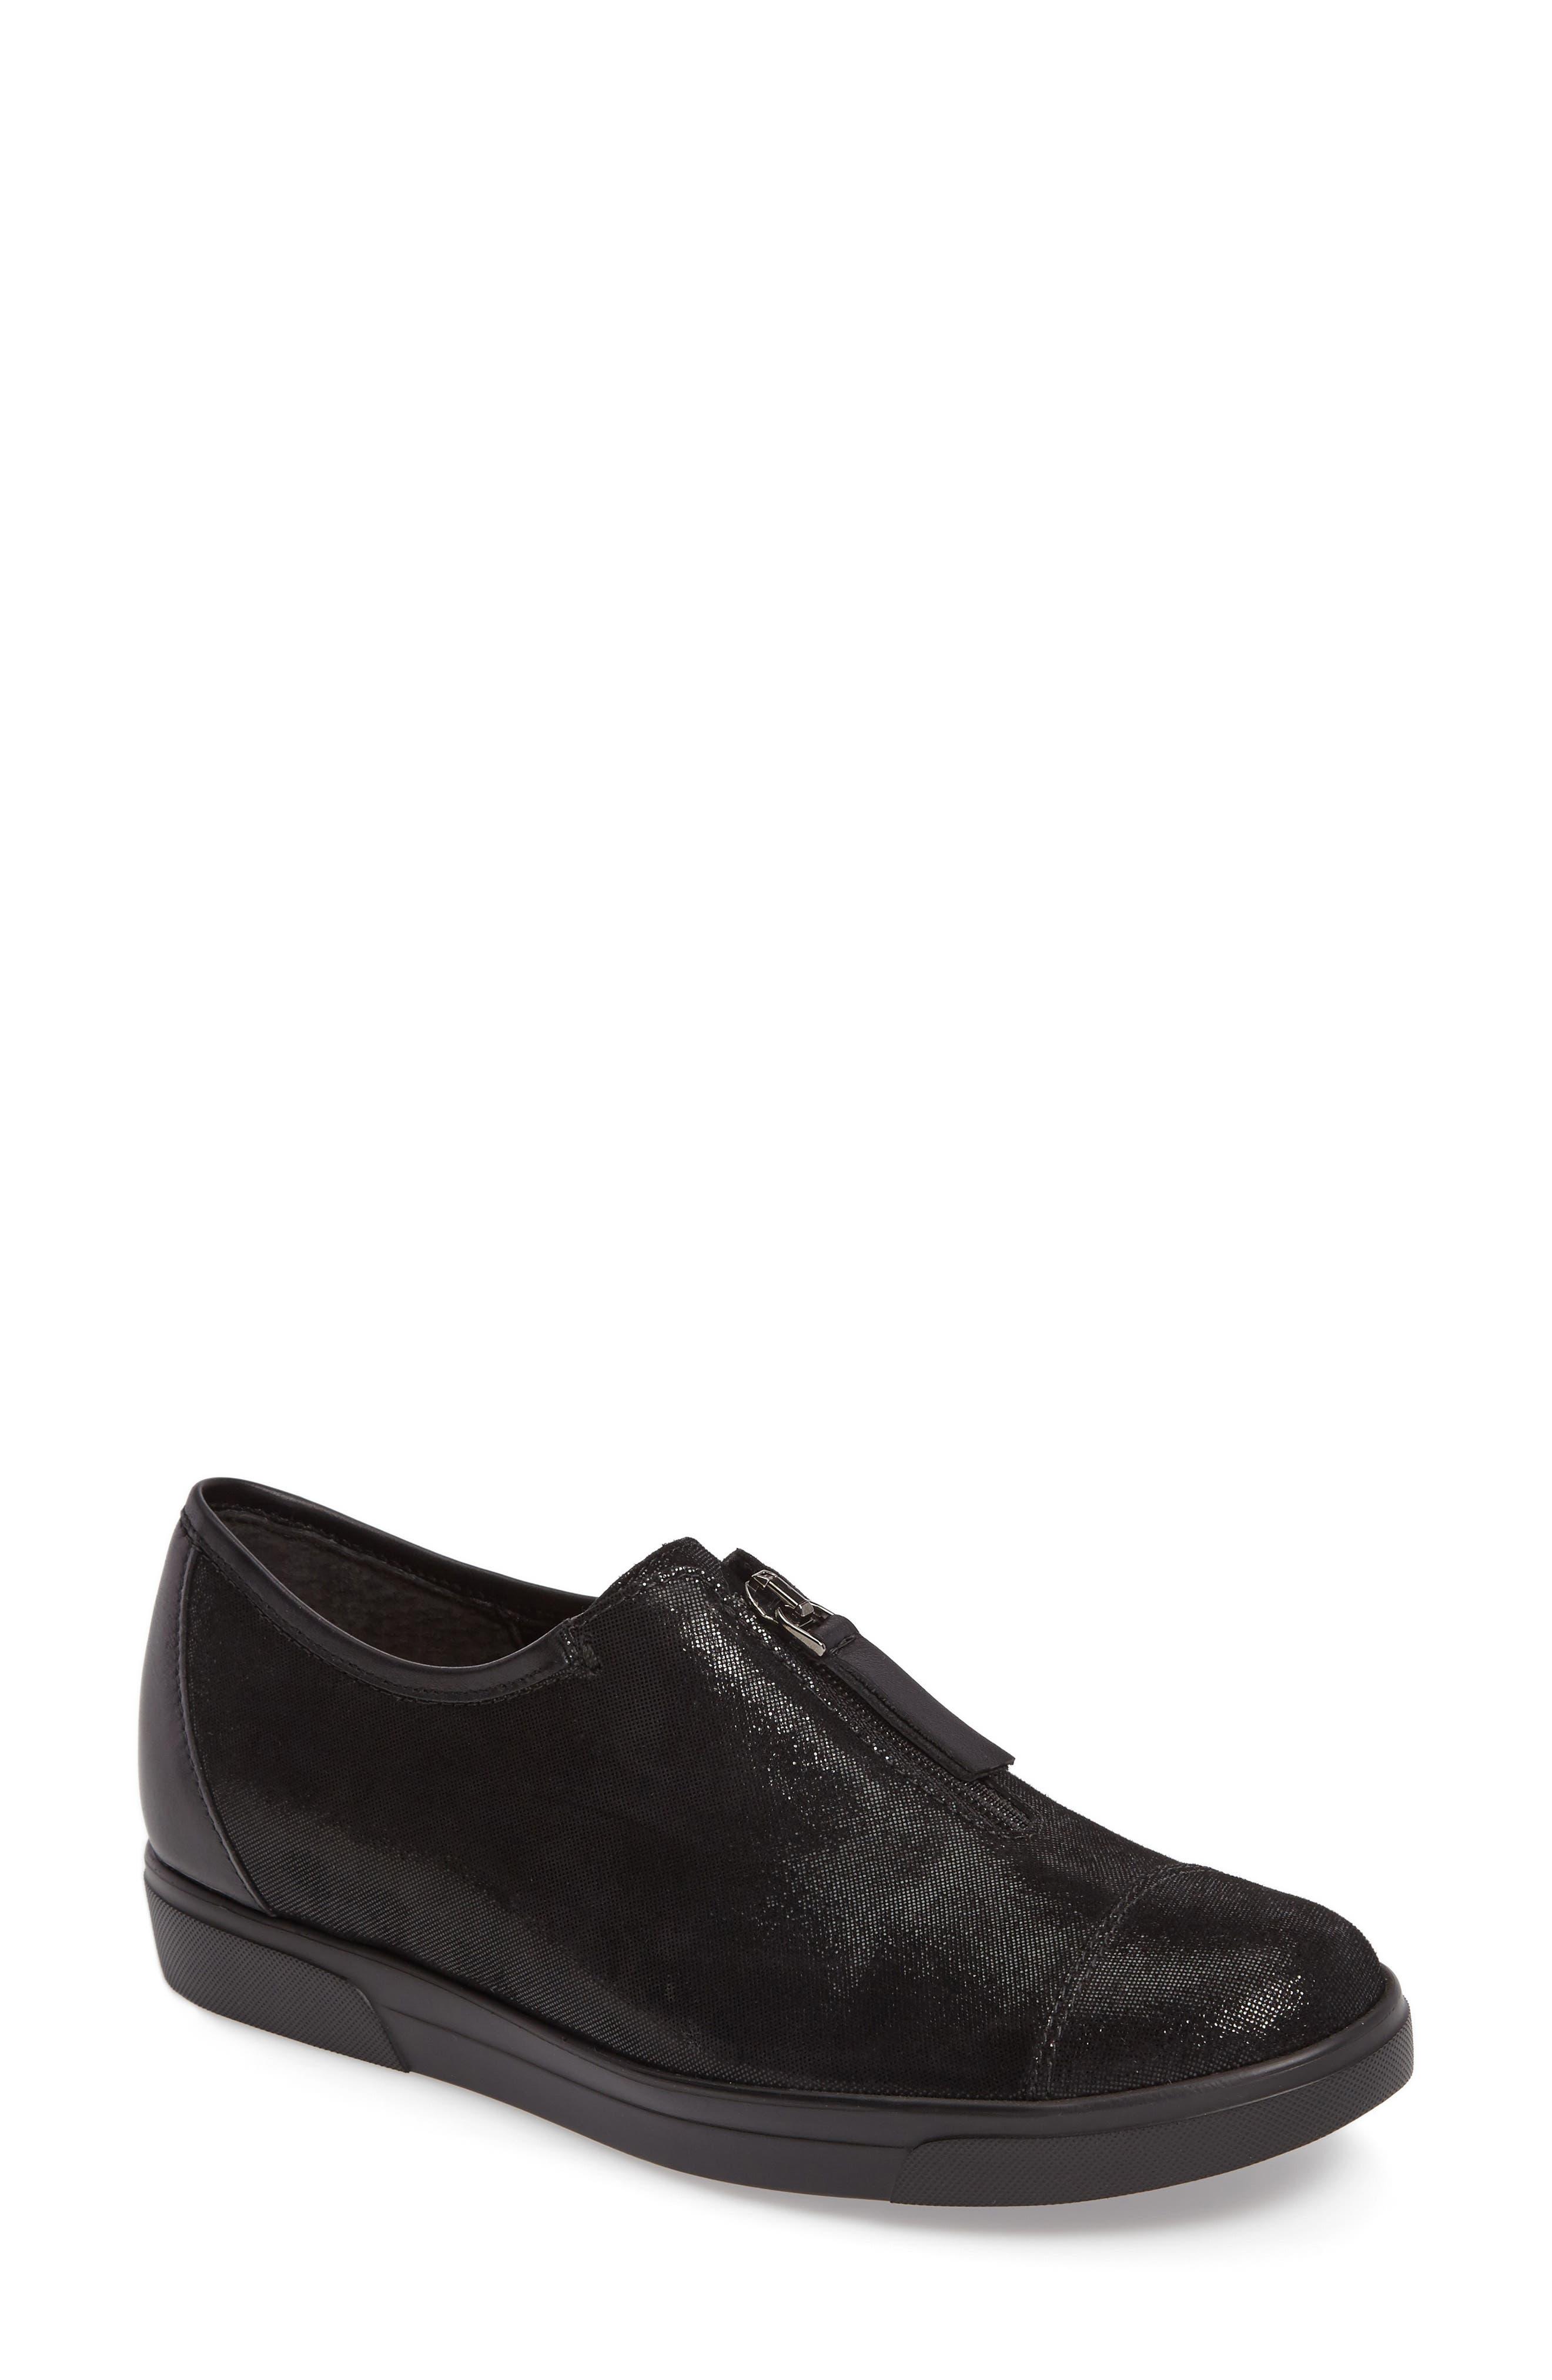 Roslyn Zip Sneaker,                         Main,                         color, 001